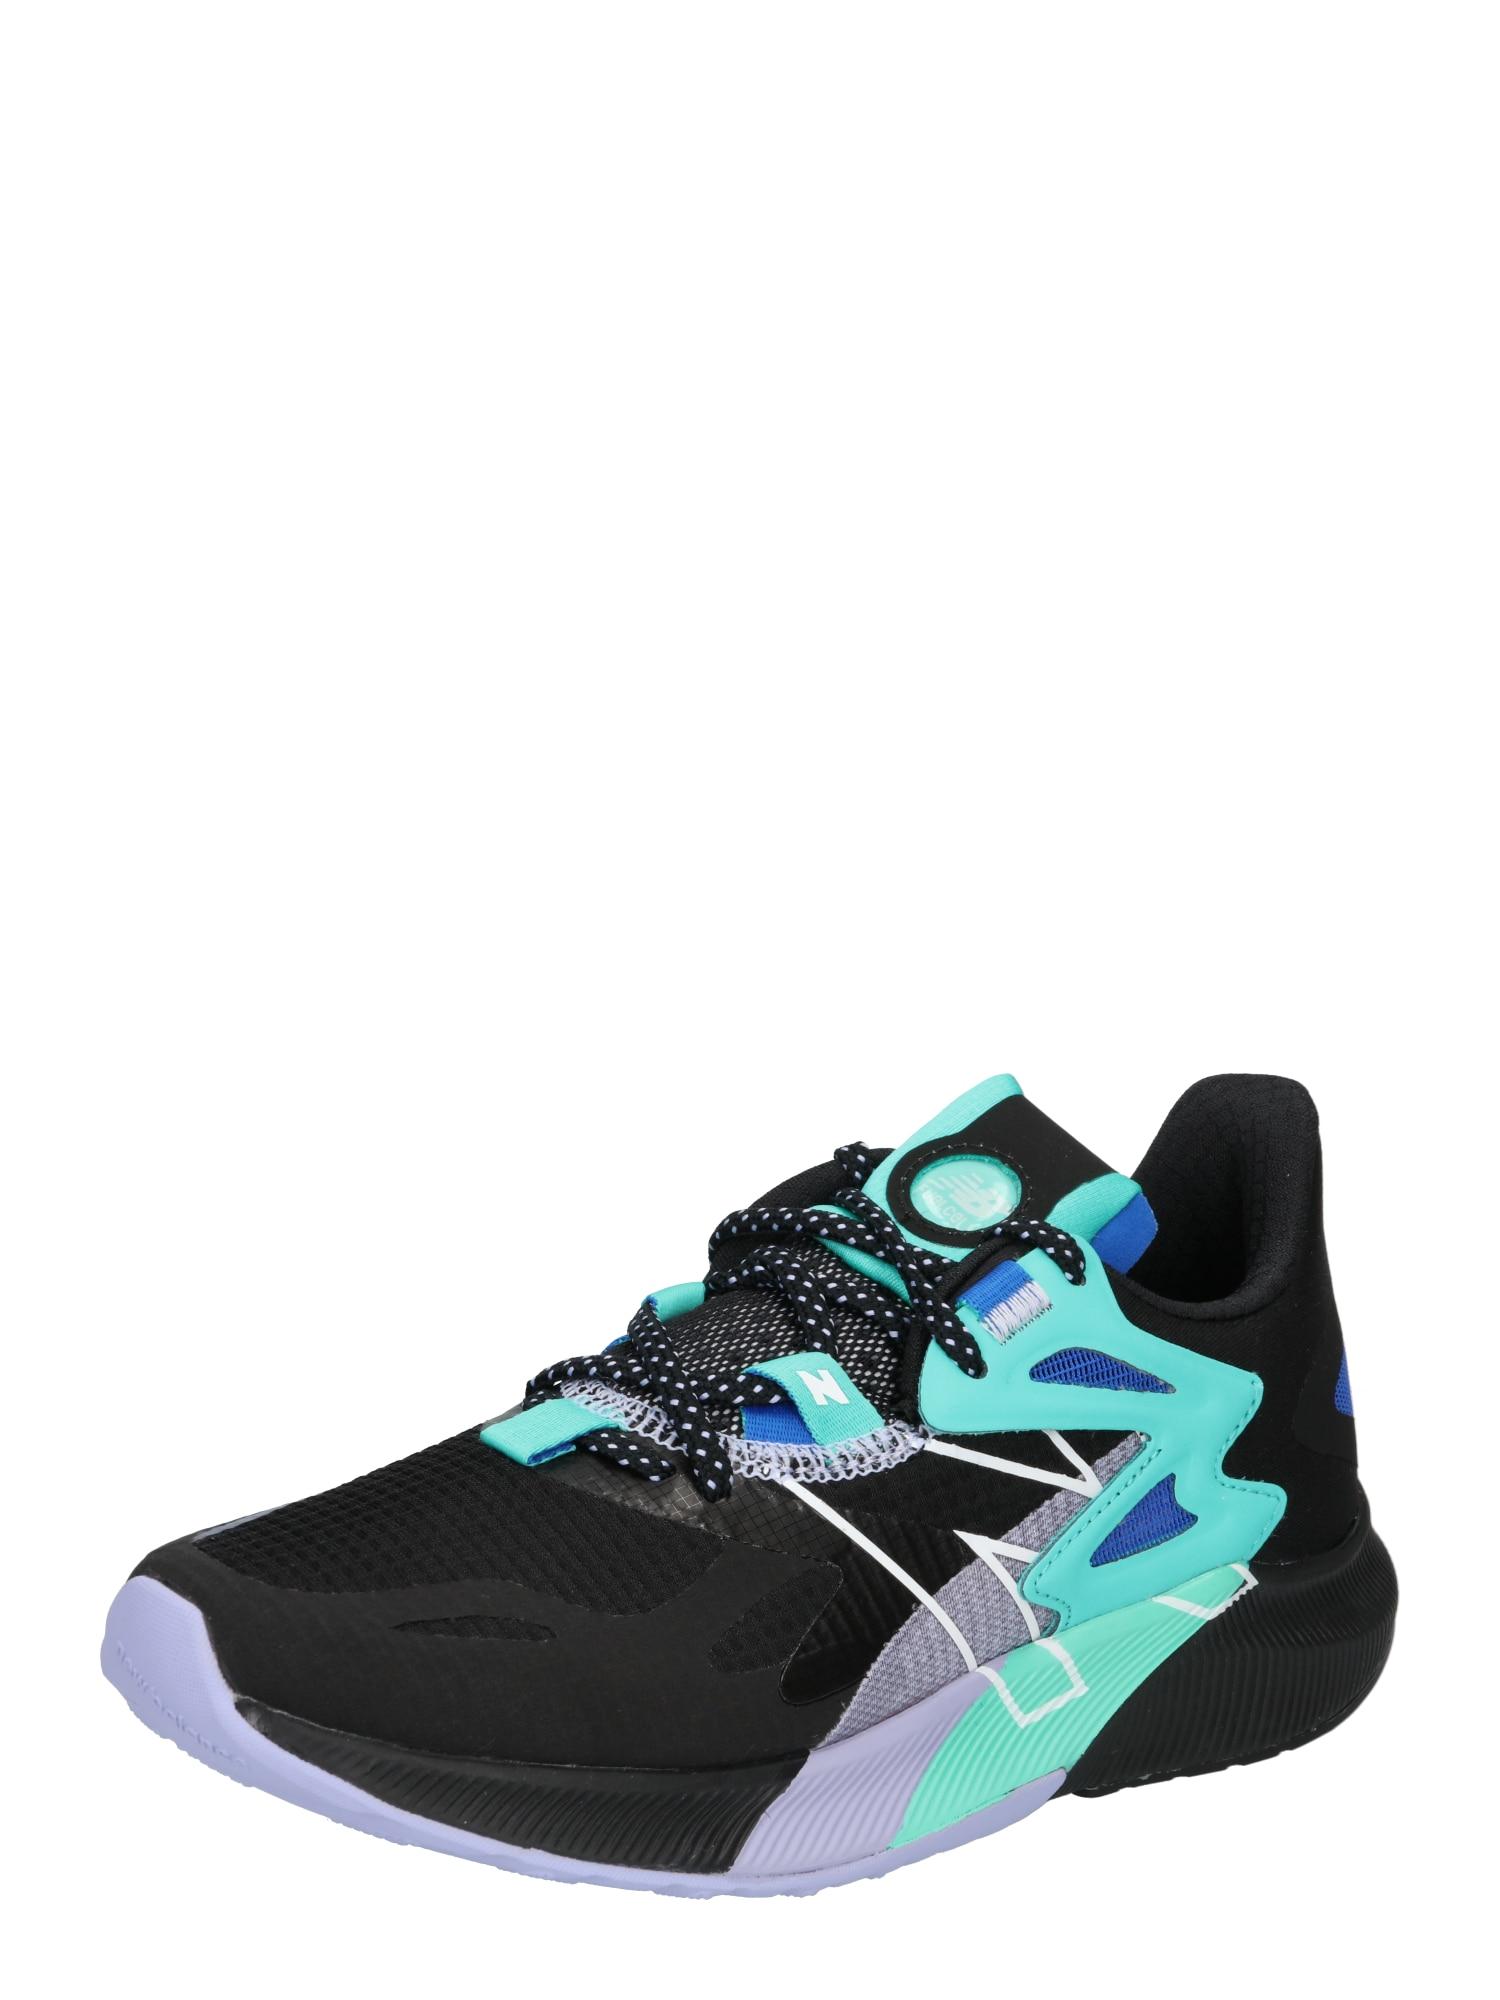 new balance Bėgimo batai juoda / turkio spalva / pilka / balta / mėlyna